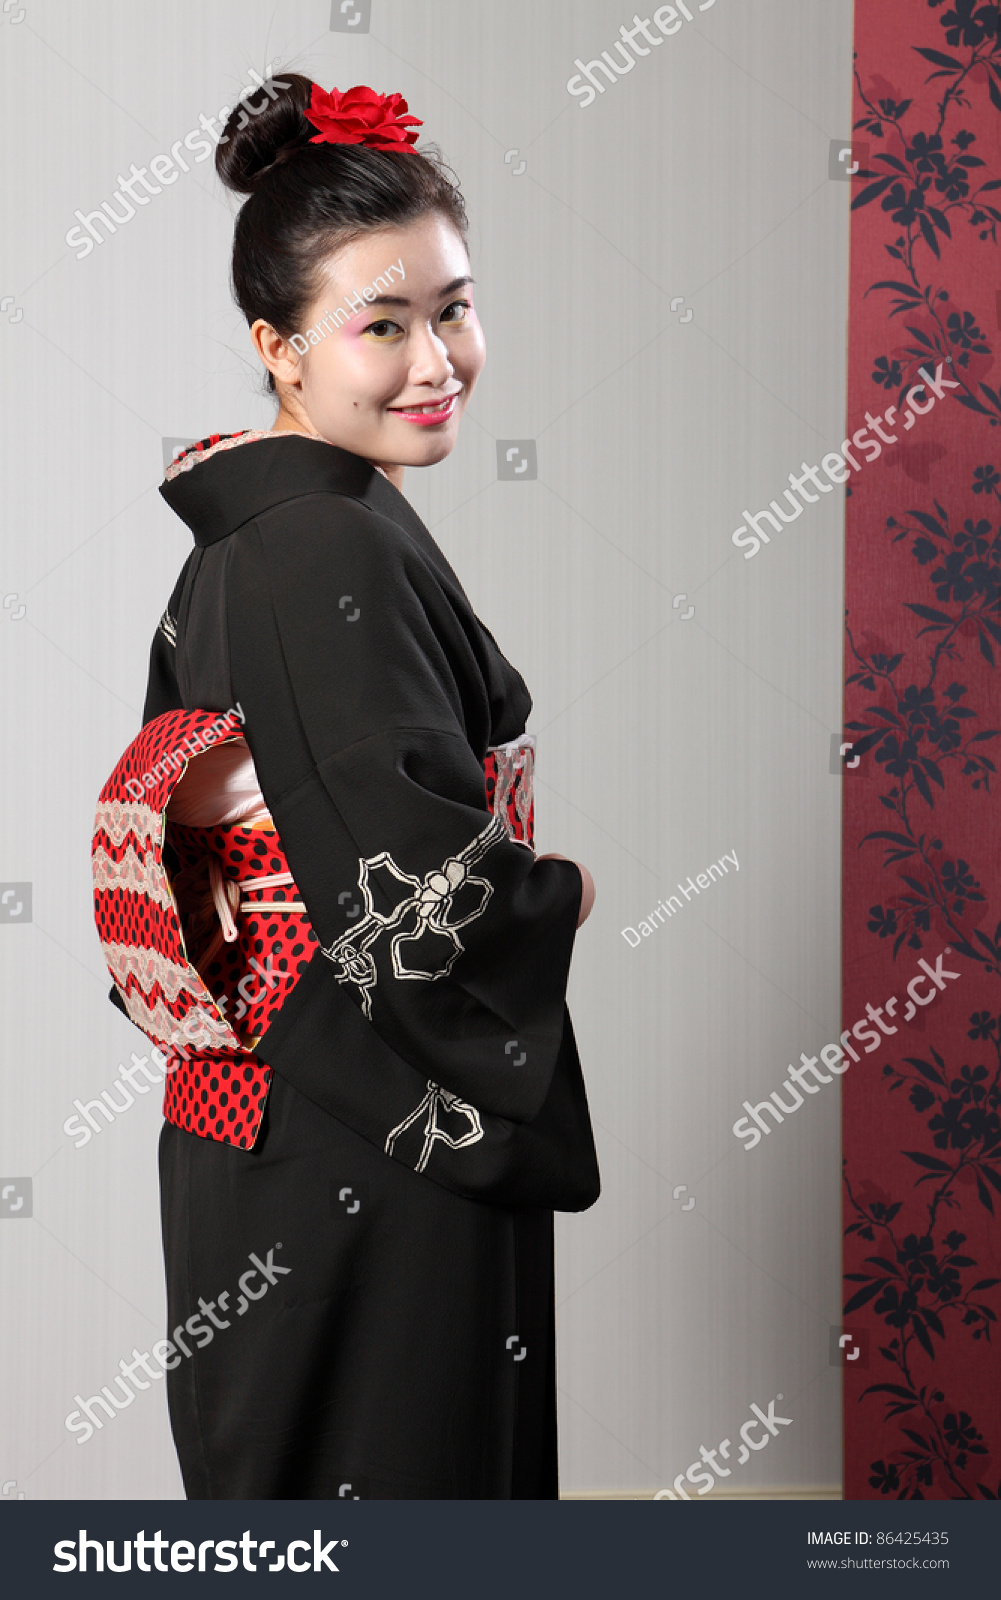 yaponku-na-vidu-u-vseh